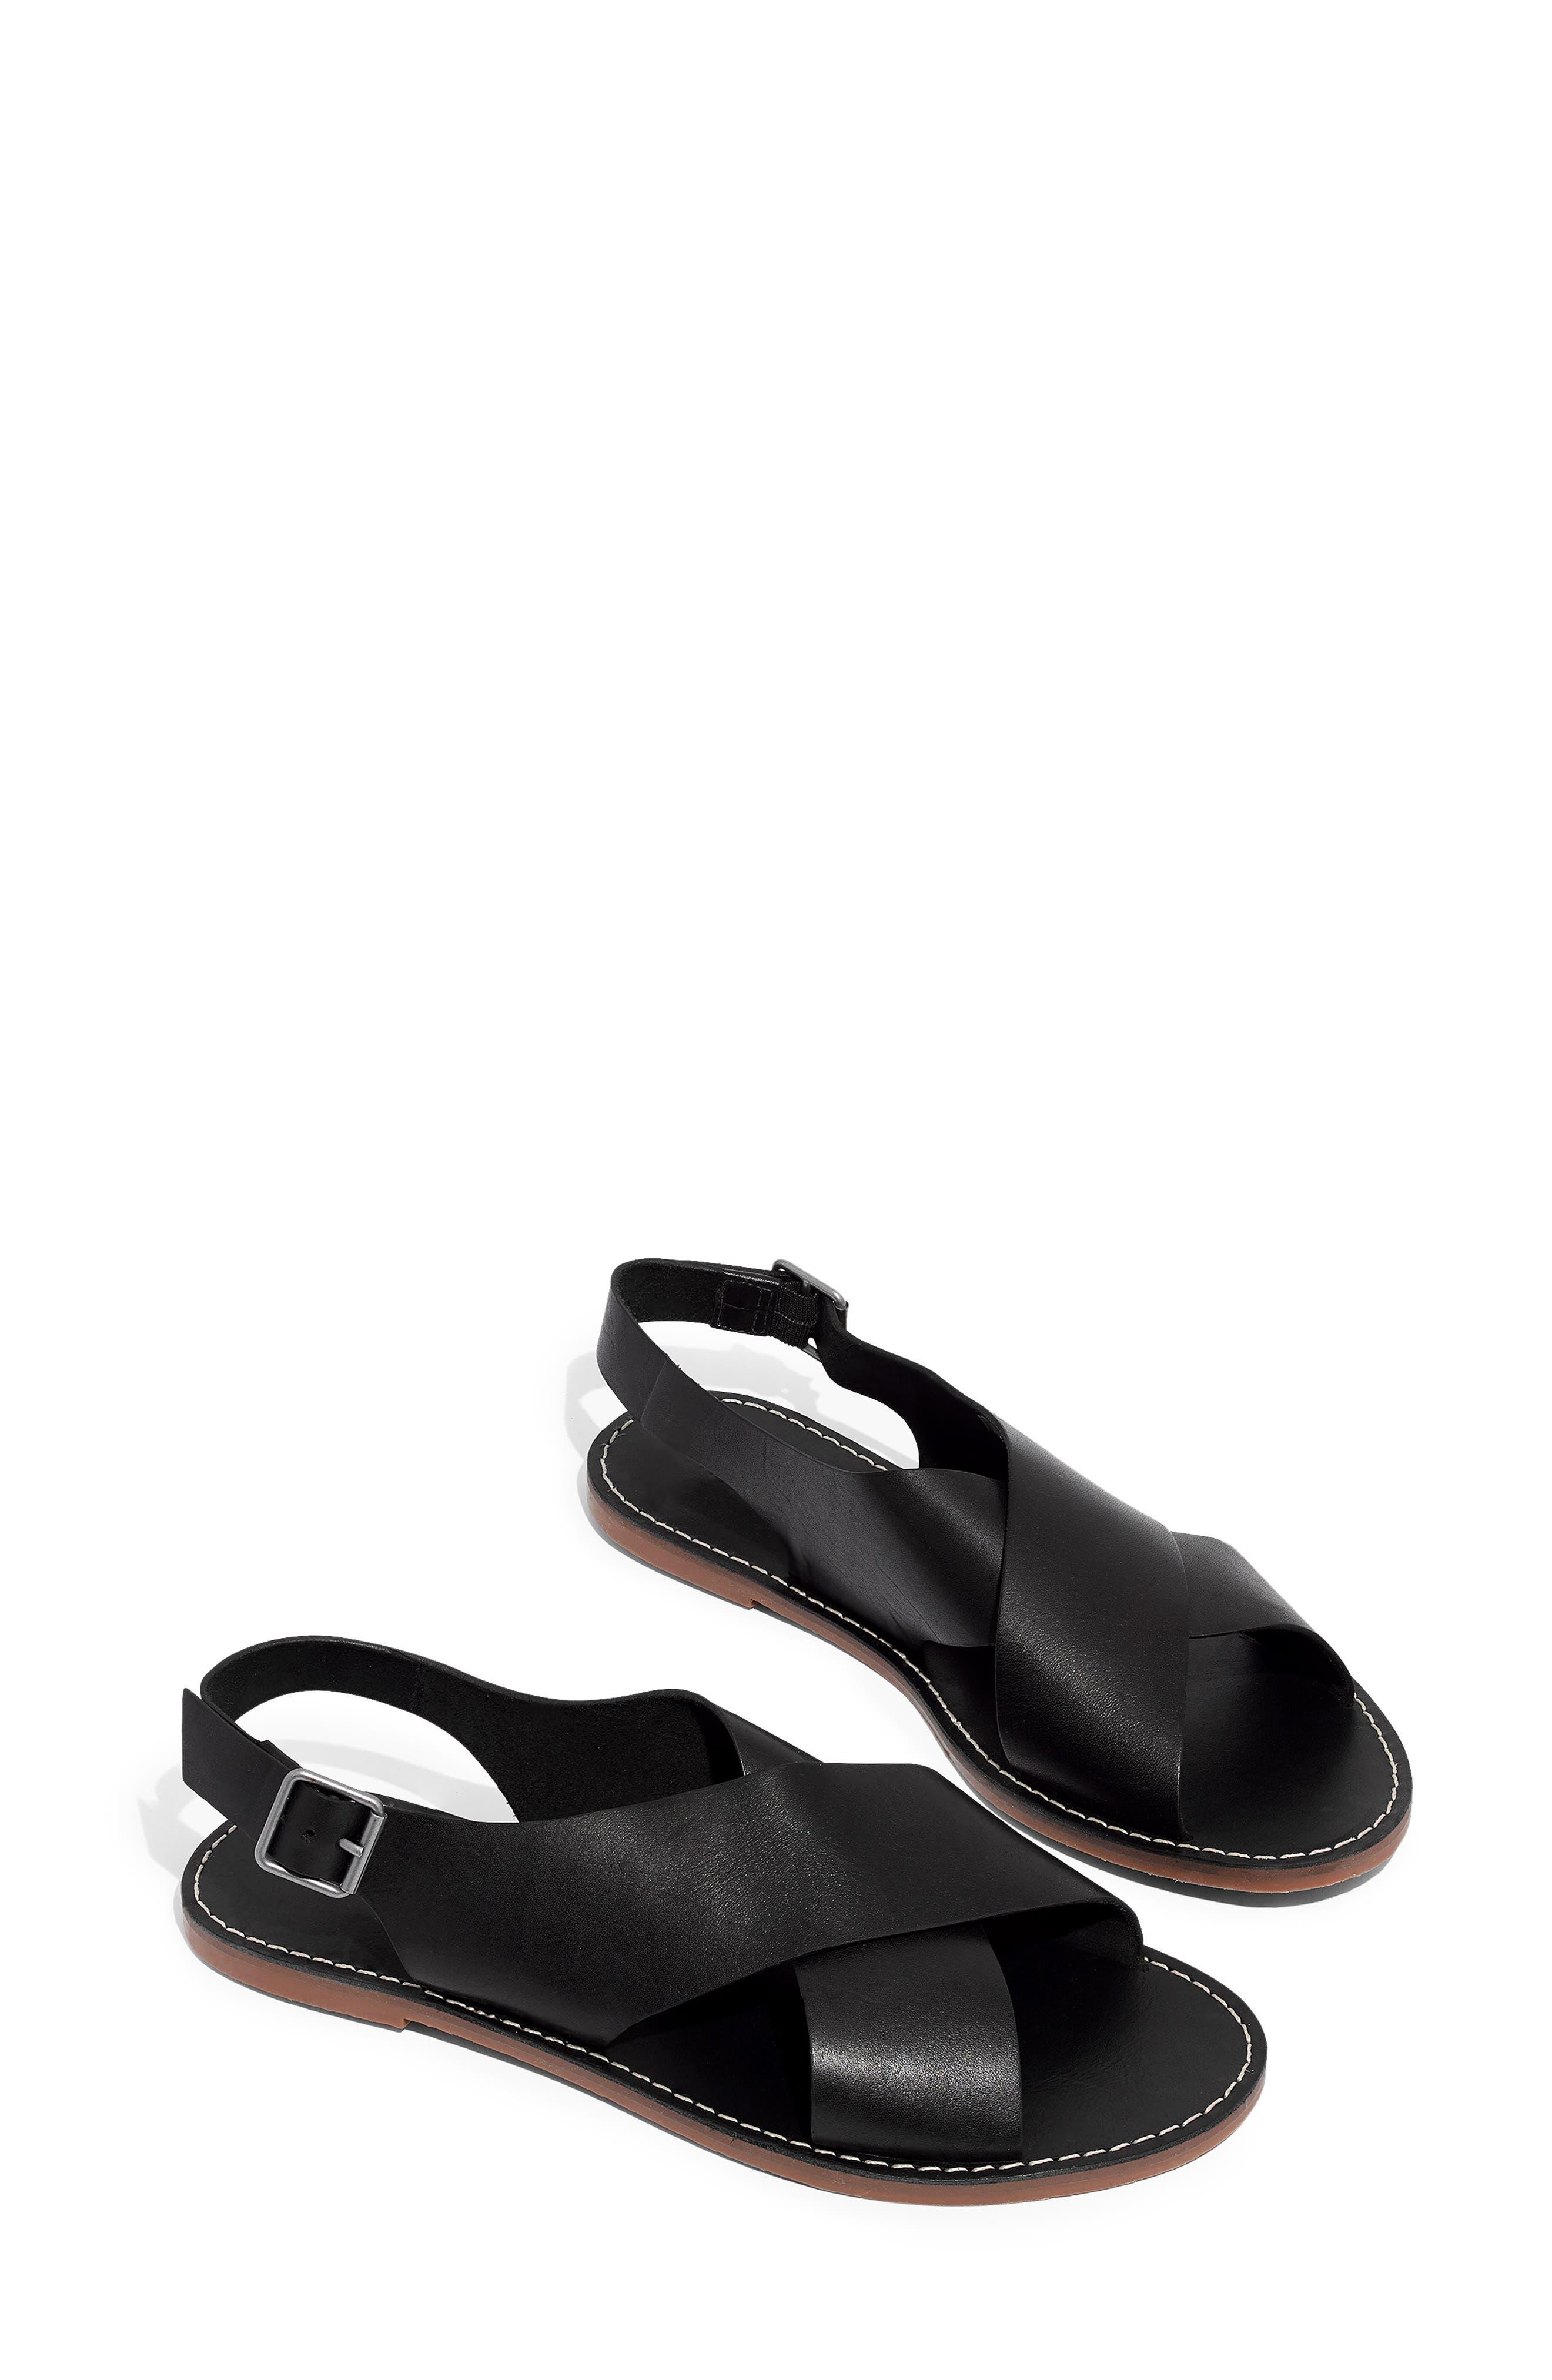 MADEWELL Boardwalk Flat Sandal, Main, color, TRUE BLACK